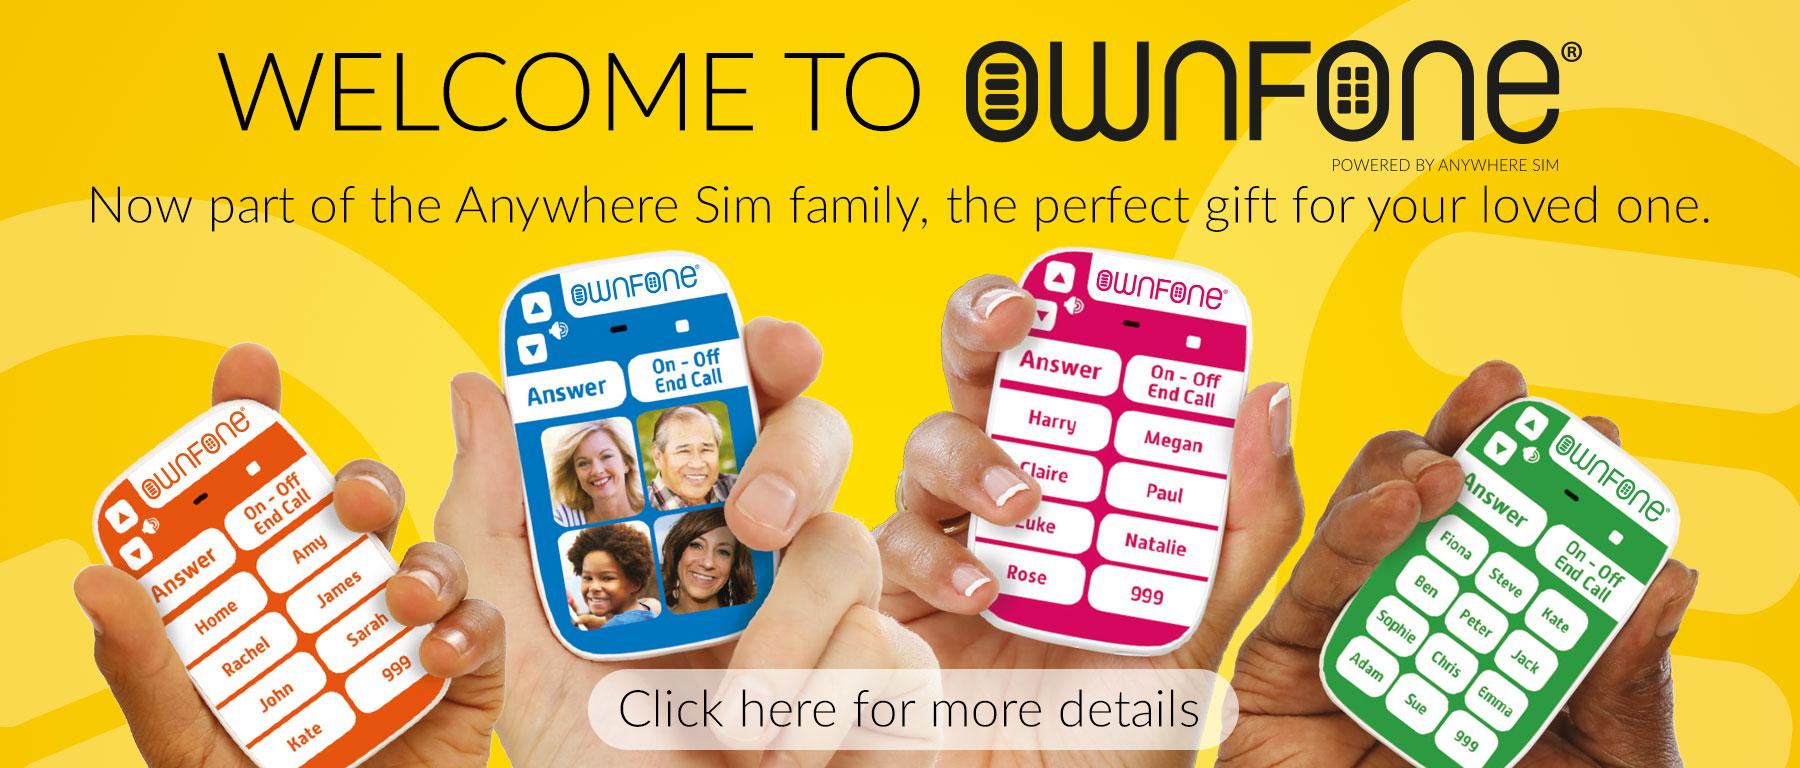 Anywhere Sim Home Page